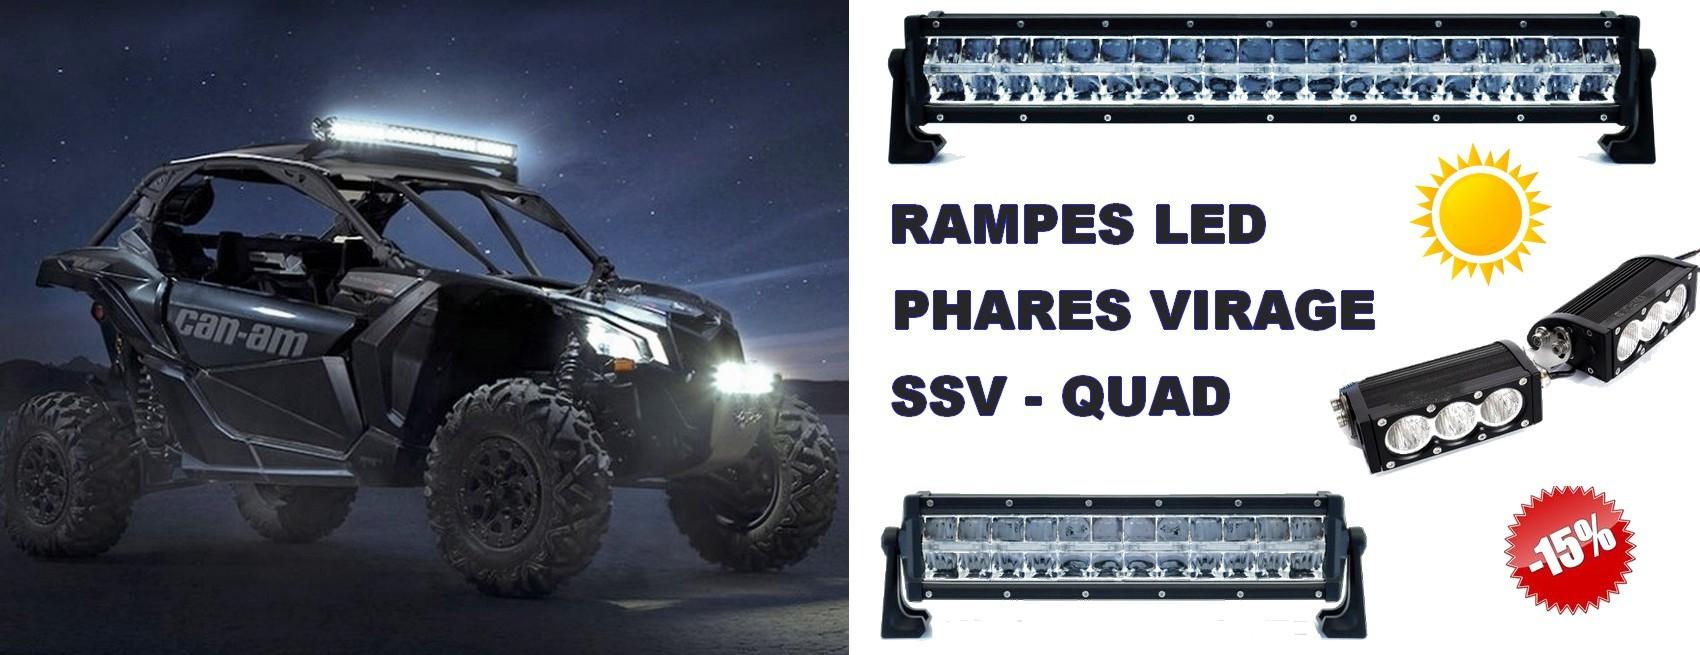 Rampe led SSV - Quad - Can am - Polaris